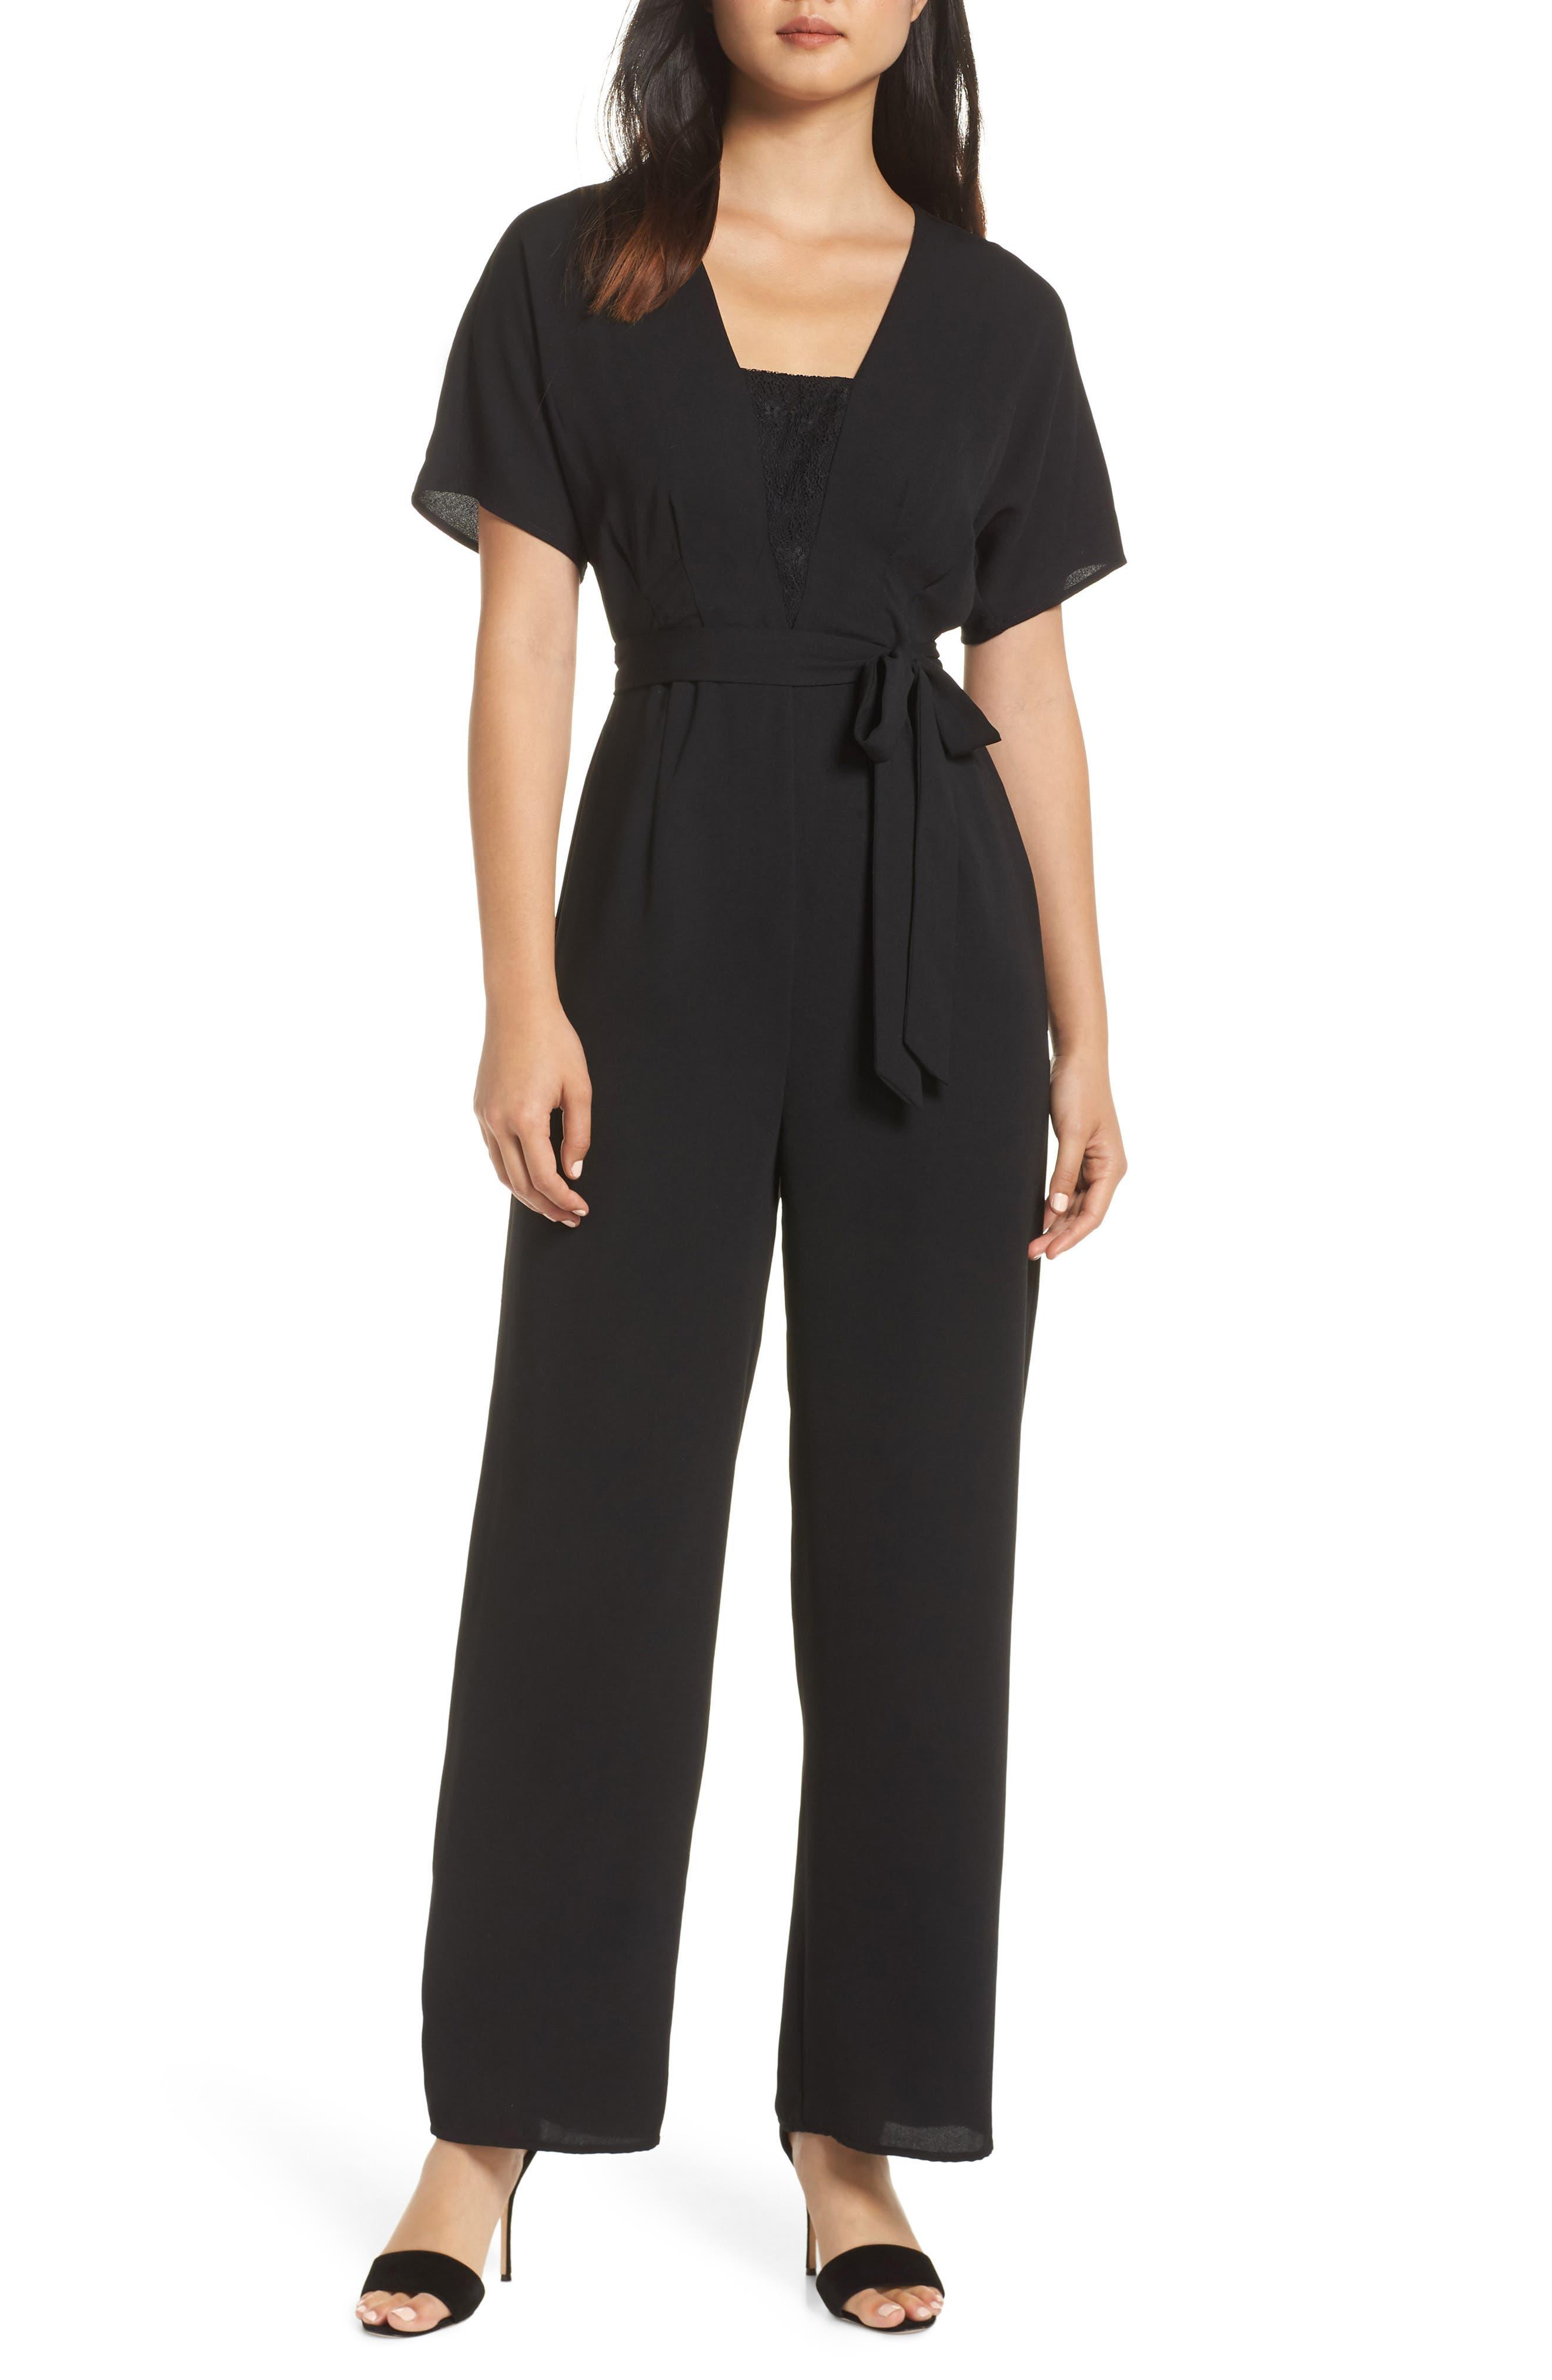 19 COOPER Lace Inset Jumpsuit in Black